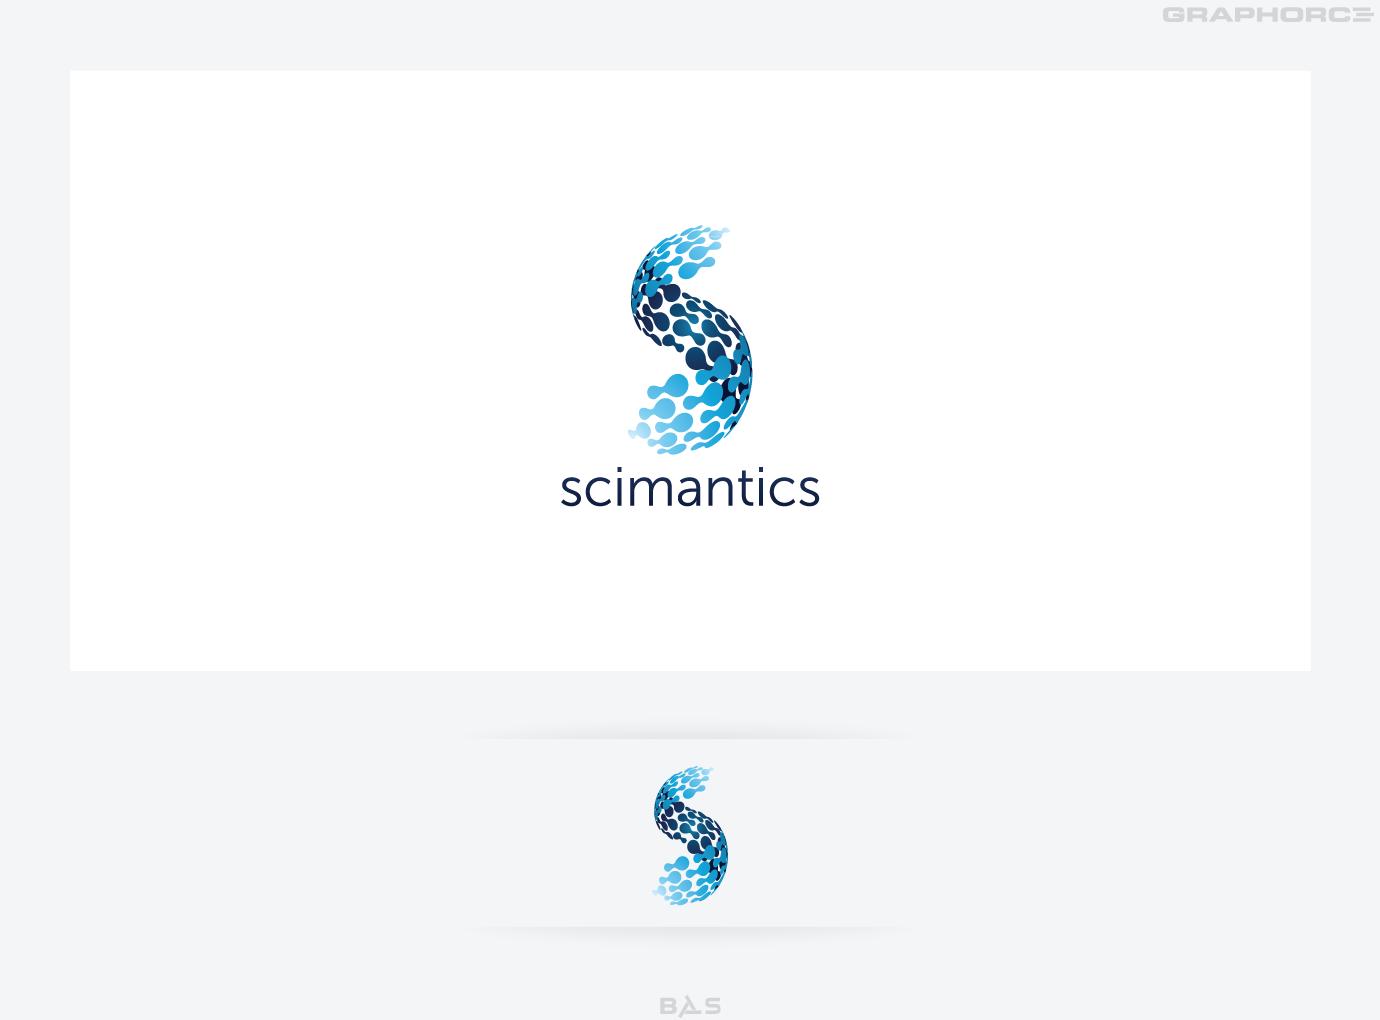 Need a mind-bending logo for Scimantics